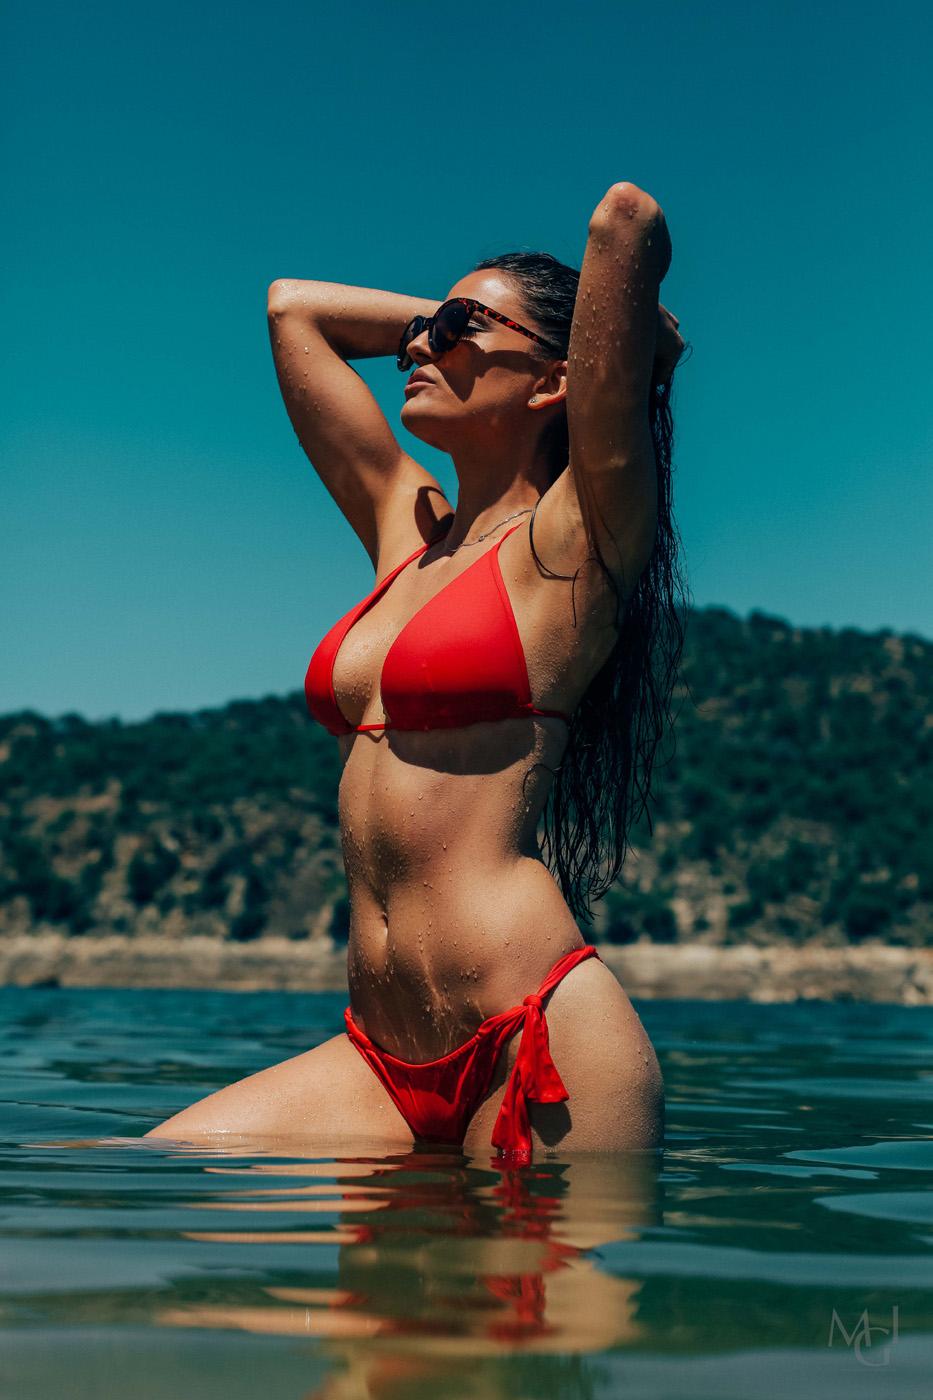 Red hot summer Women  Rocio Nieto photoshooting photoshoot photography photographer Michael Galvante Ibias MGIBIAS editorial body art bikini   // lionsmag.com - premium nude photography magazine